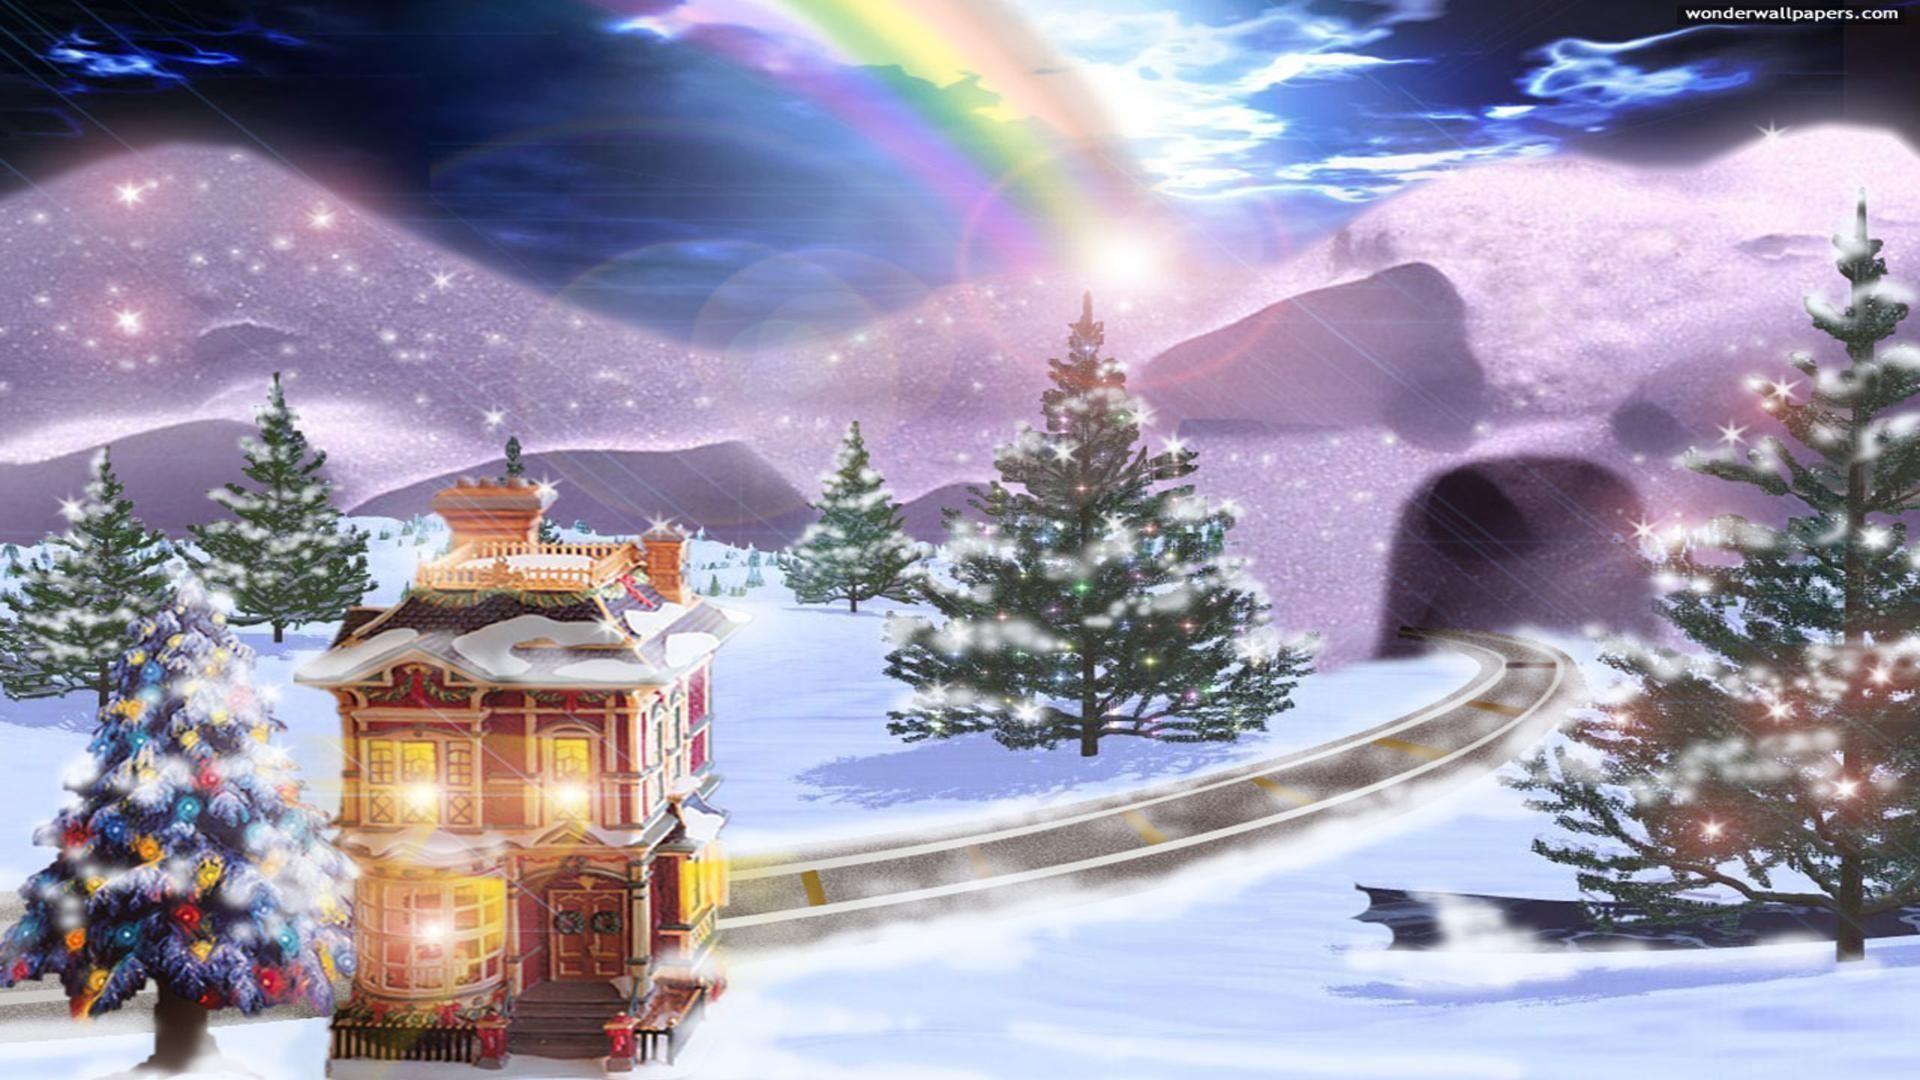 Beautiful Animated Girl Wallpaper Christmas Scenes Wallpaper 42 Images